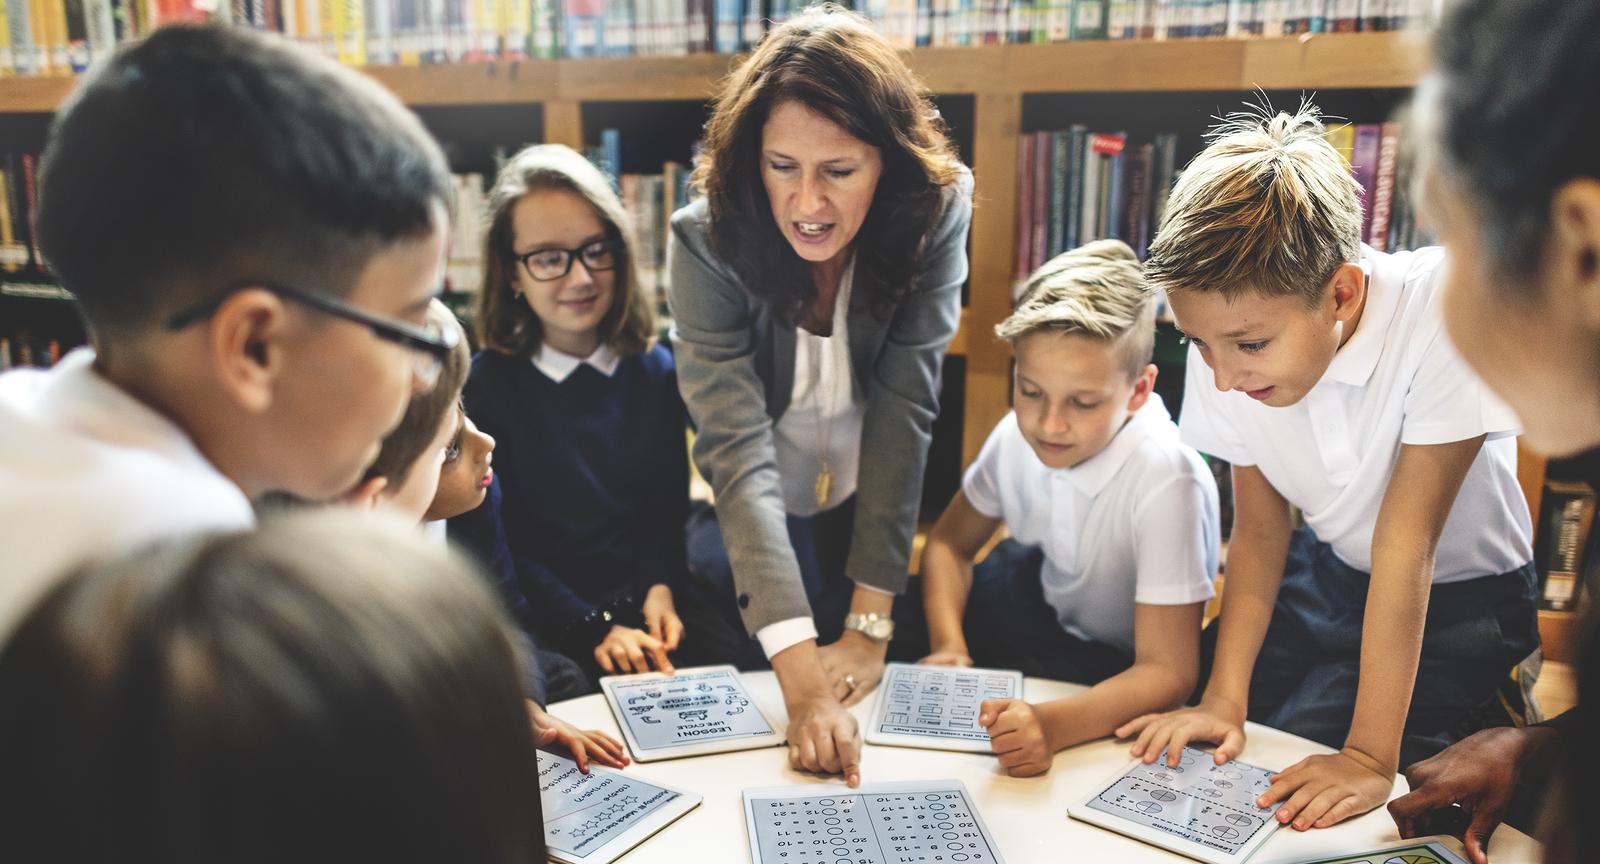 How to teach your child teamwork | TheSchoolRun